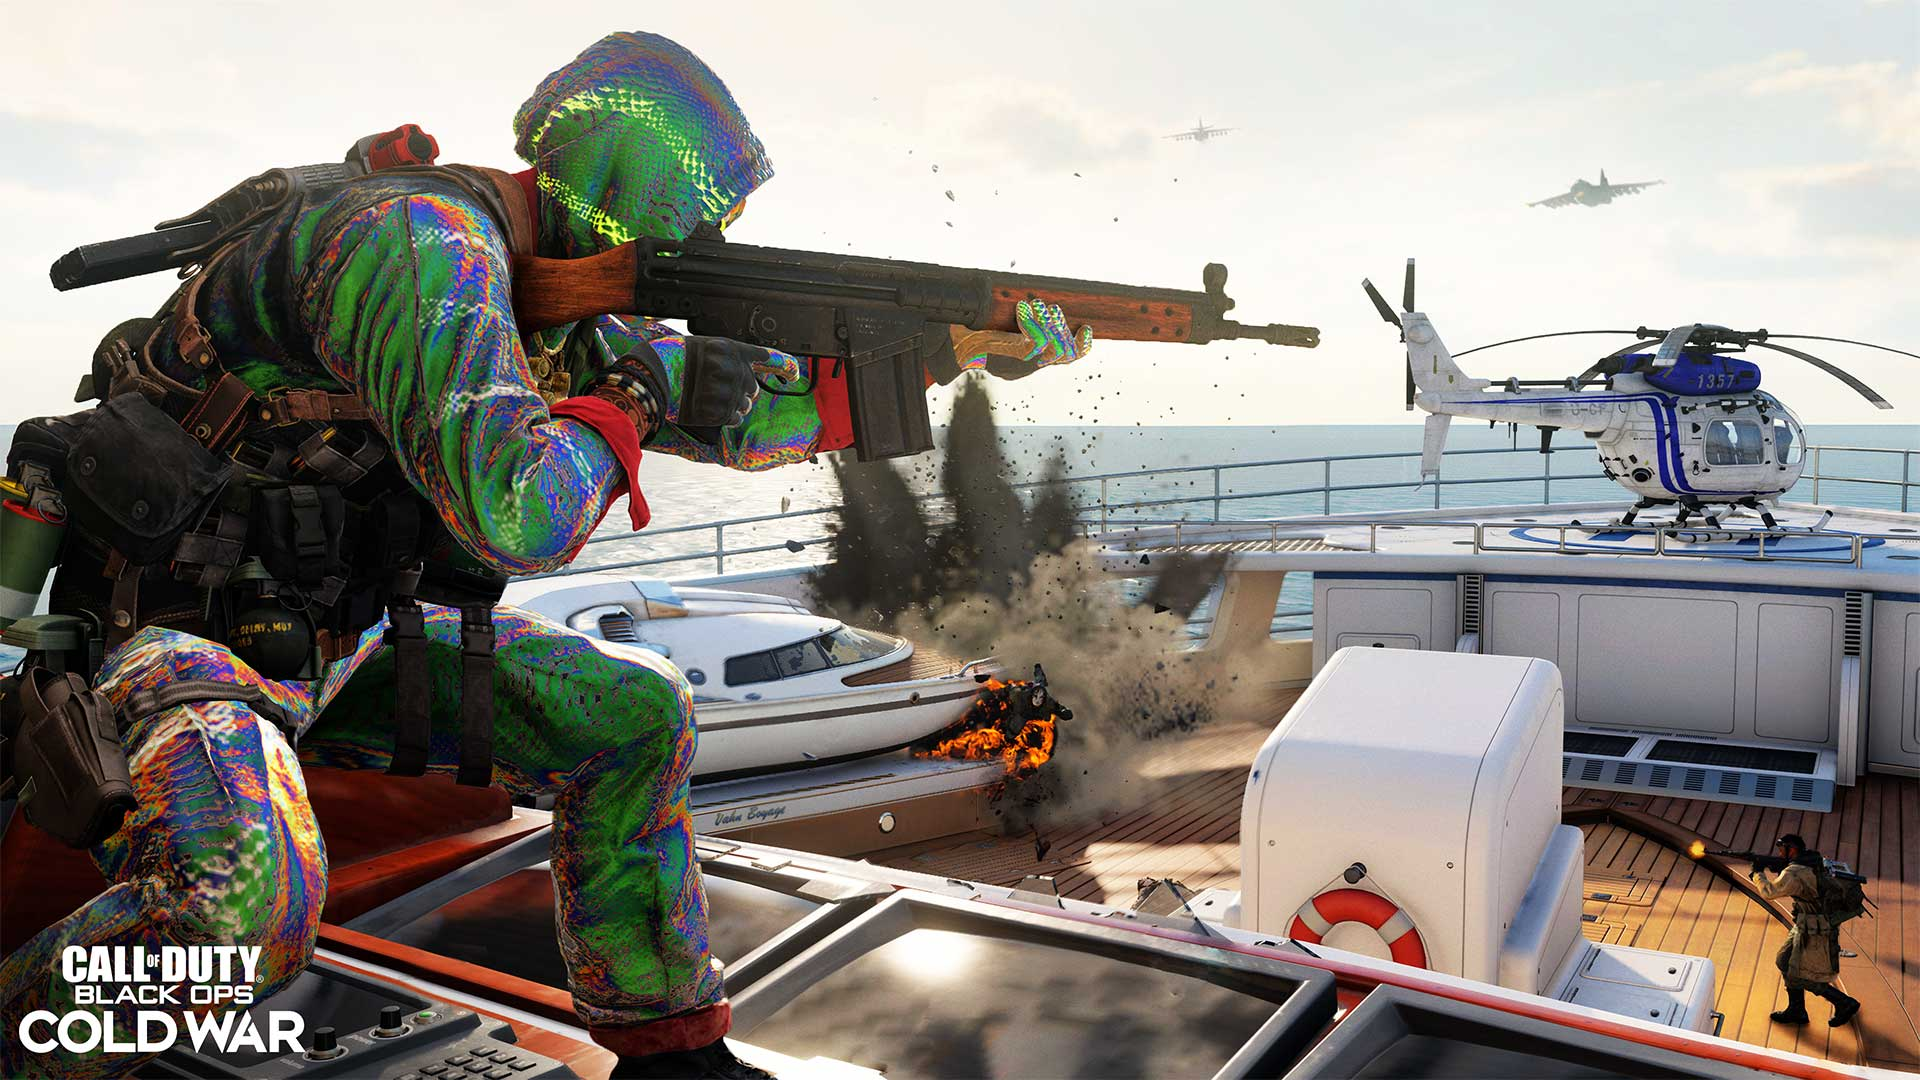 Call of Duty black ops cold war c58 new gun